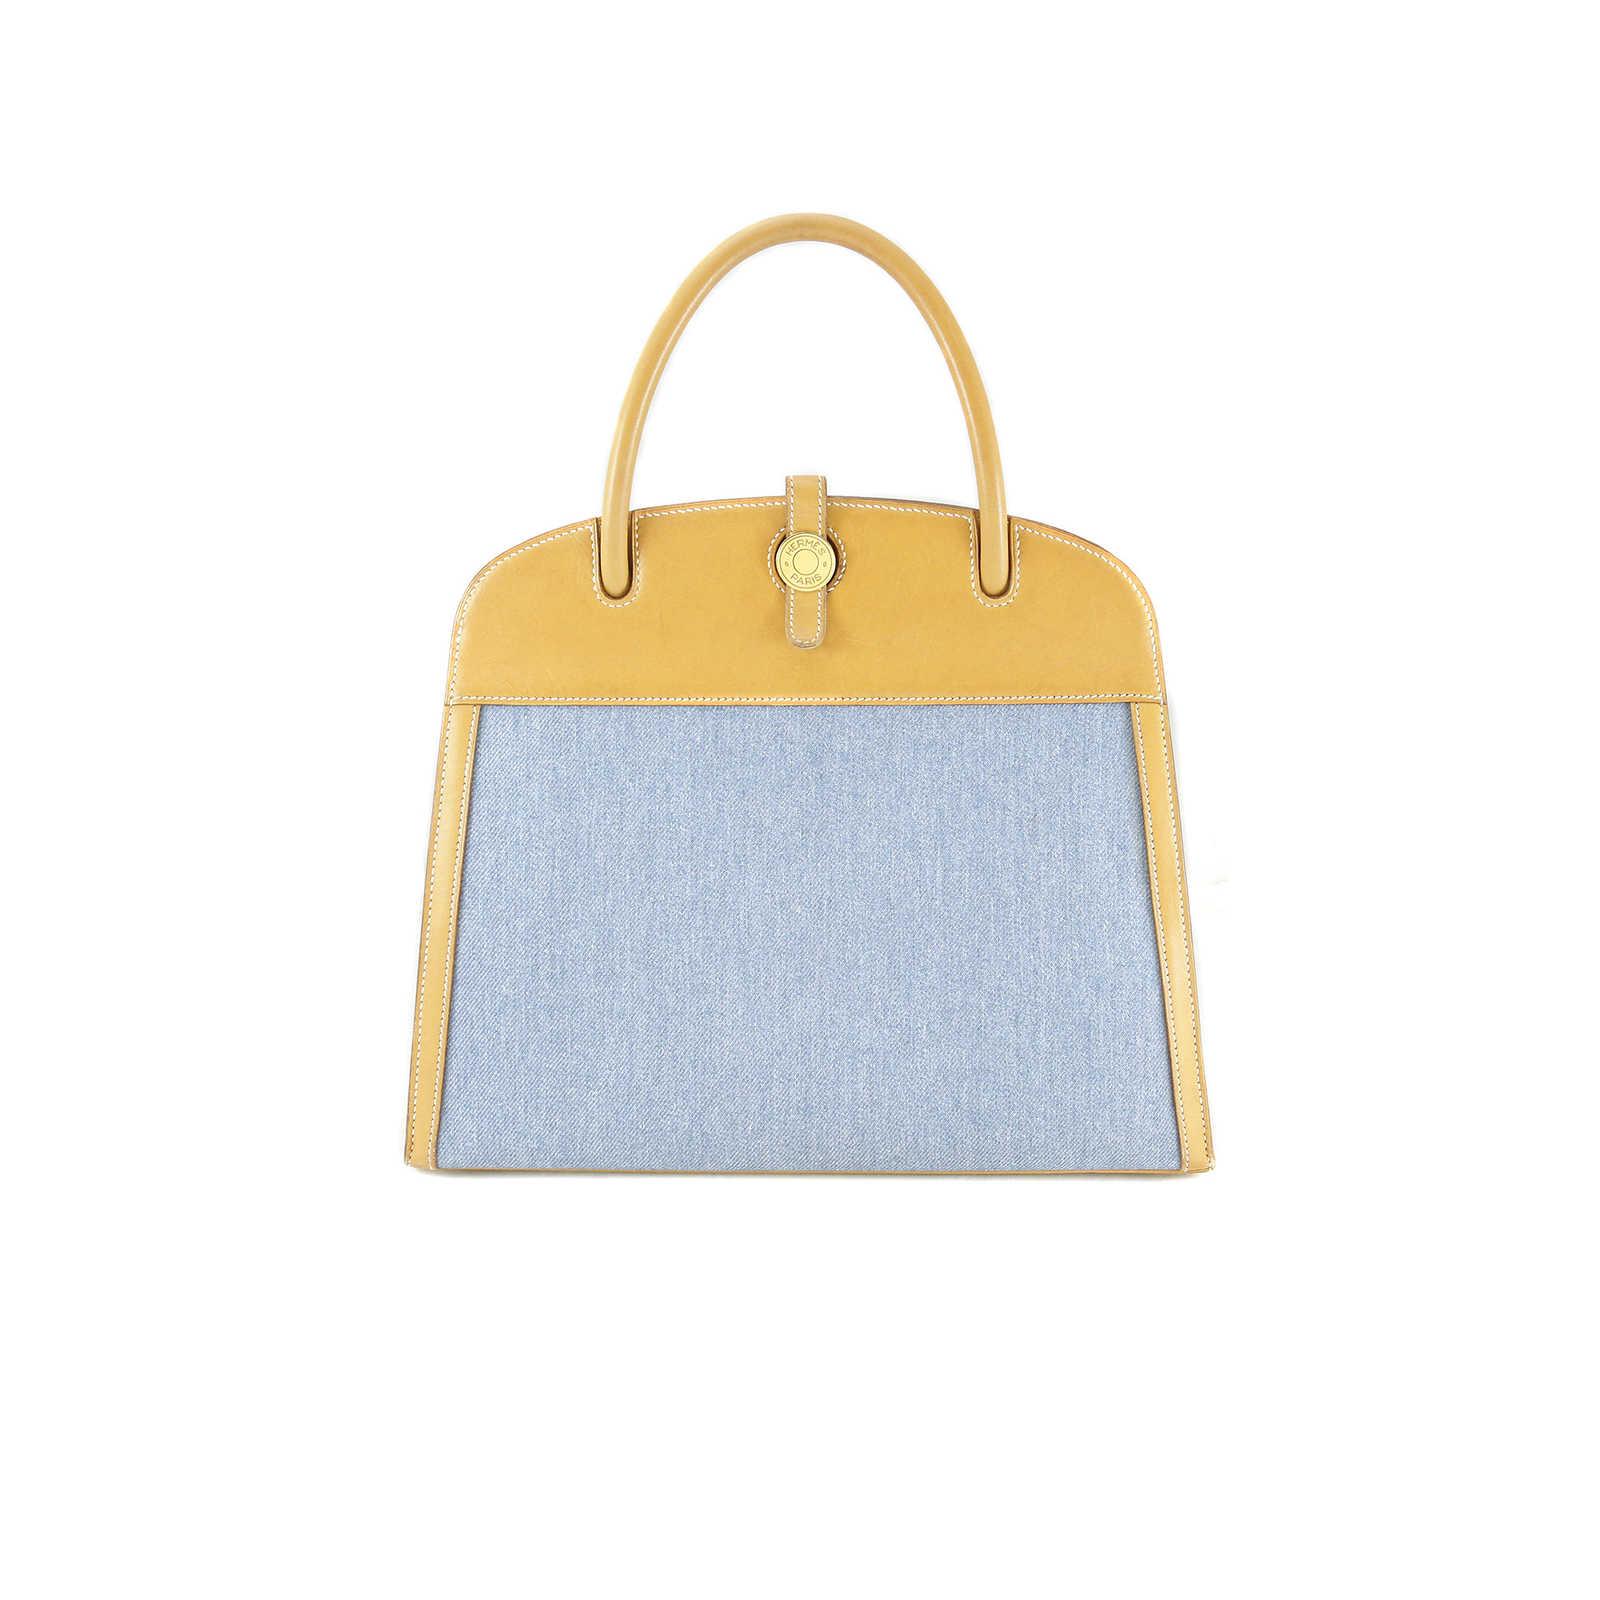 16581af77509 ... birkin handbag facts 798e8 0c974 spain hermes dalvy bag thumbnail 0  7bcc9 3ef32 ...